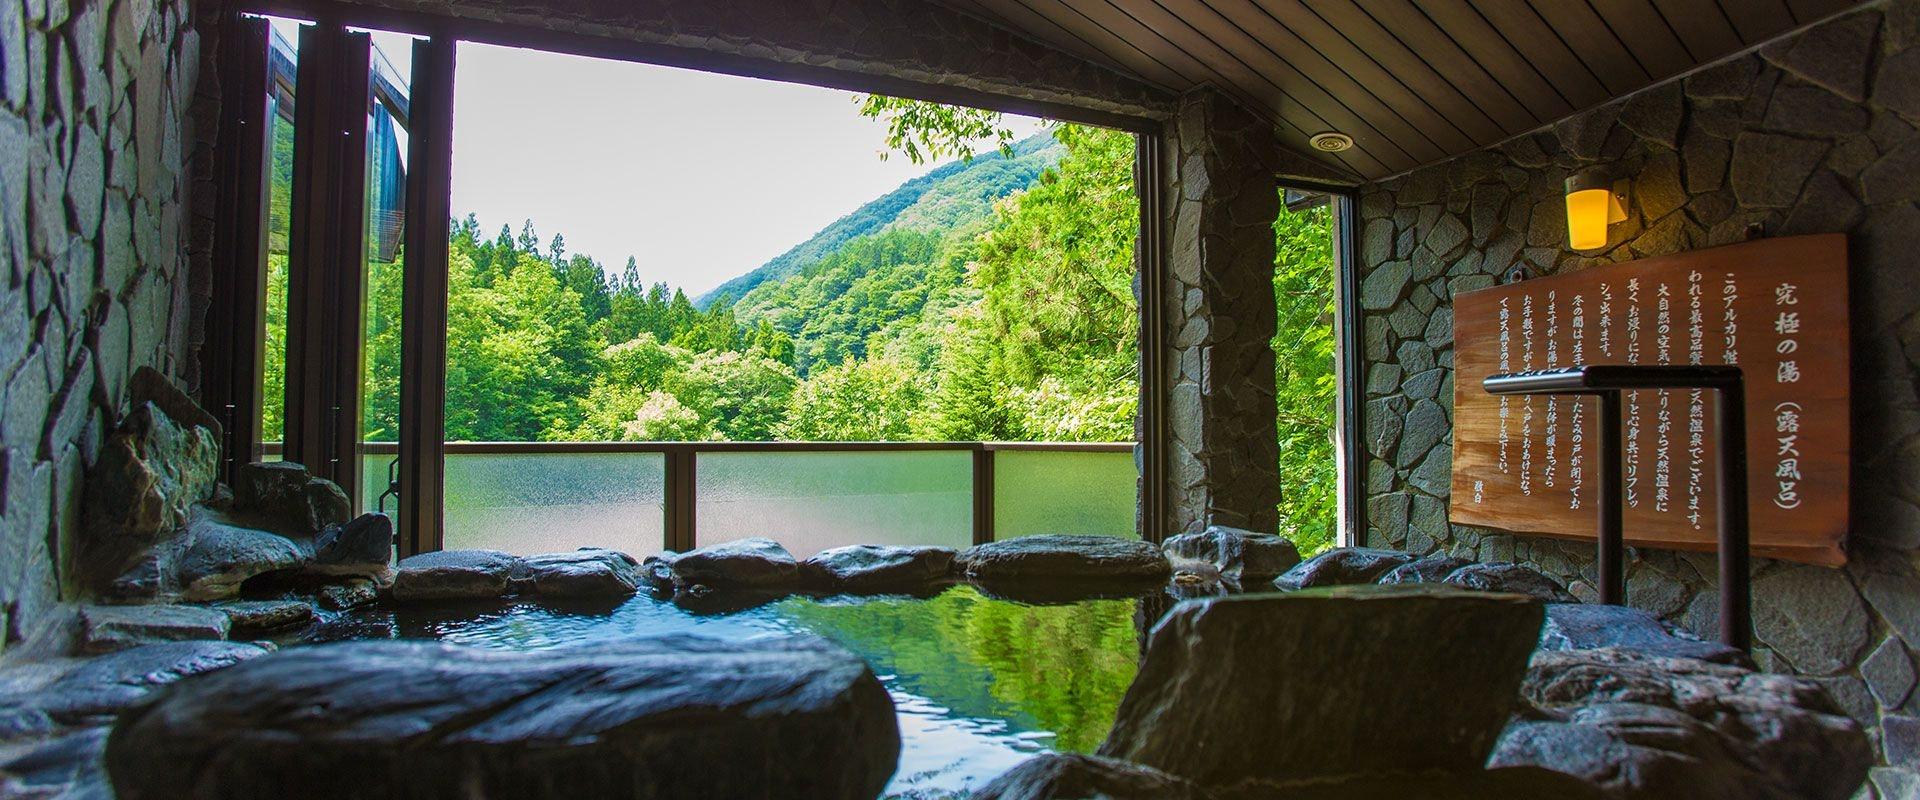 檜の宿 水上山荘 温泉